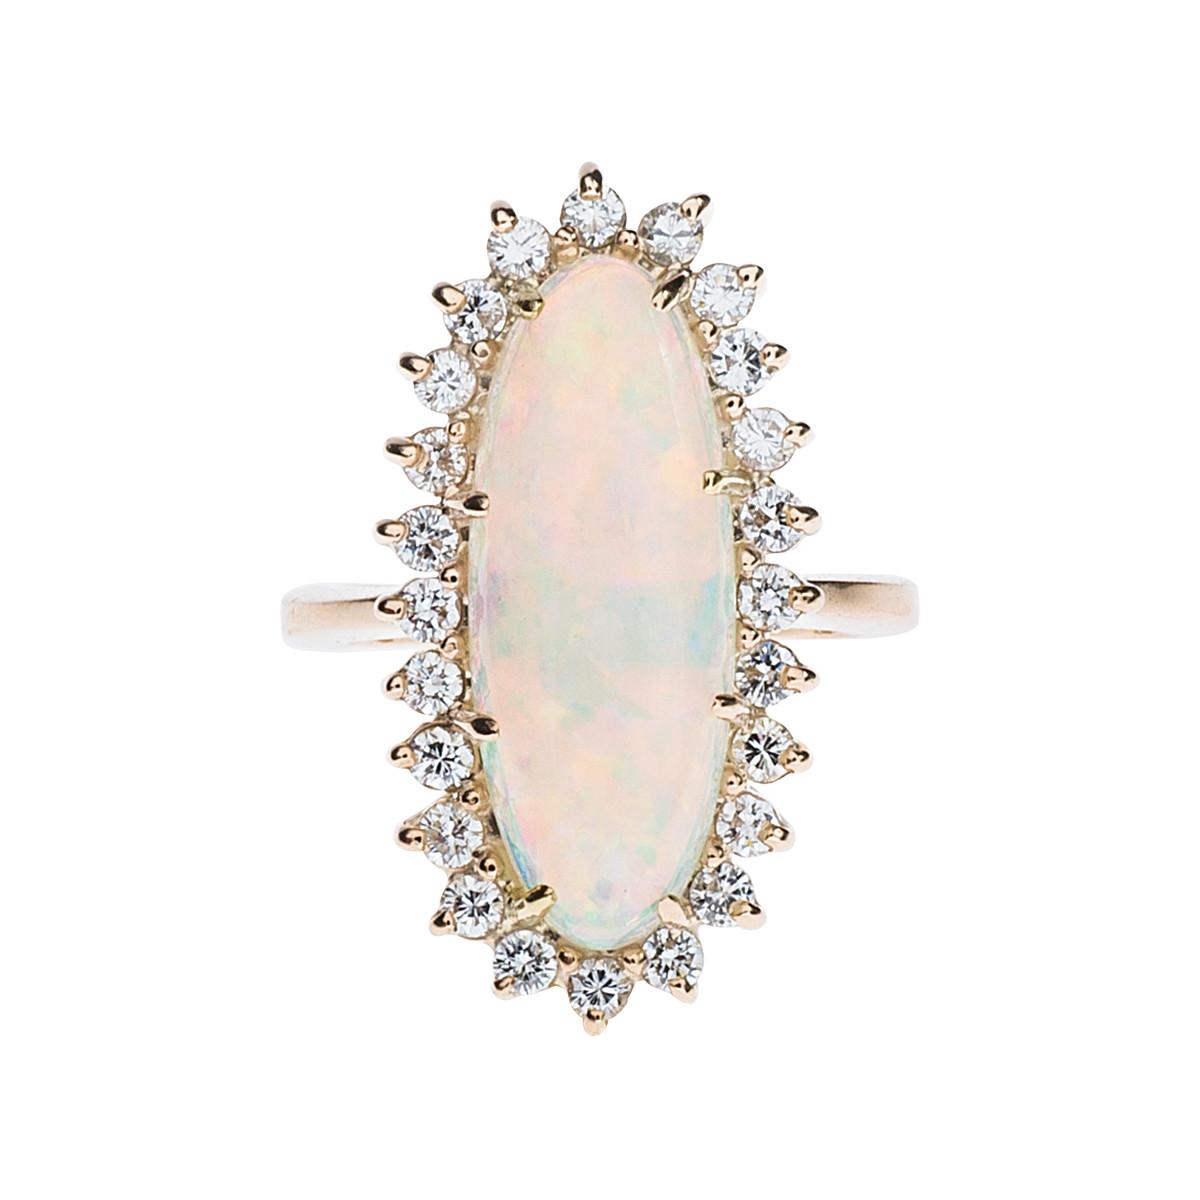 Vintage 4.96 CTW Opal & Diamond Ring